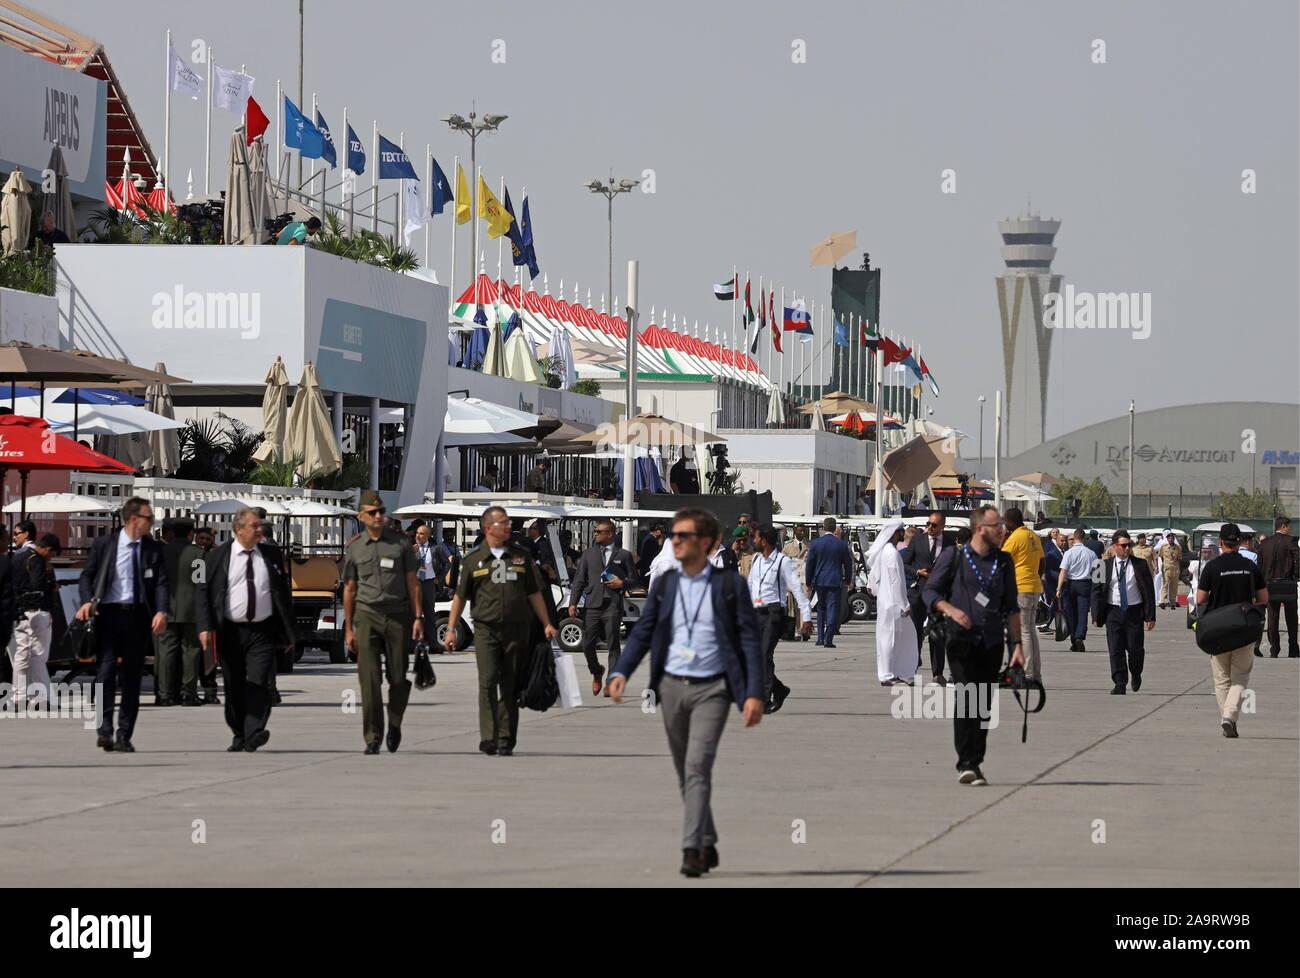 Dubai, United Arab Emirates. 17th Nov, 2019. DUBAI, UNITED ARAB EMIRATES - NOVEMBER 17, 2019: People attend the 2019 Dubai Airshow. Marina Lystseva/TASS Credit: ITAR-TASS News Agency/Alamy Live News Stock Photo